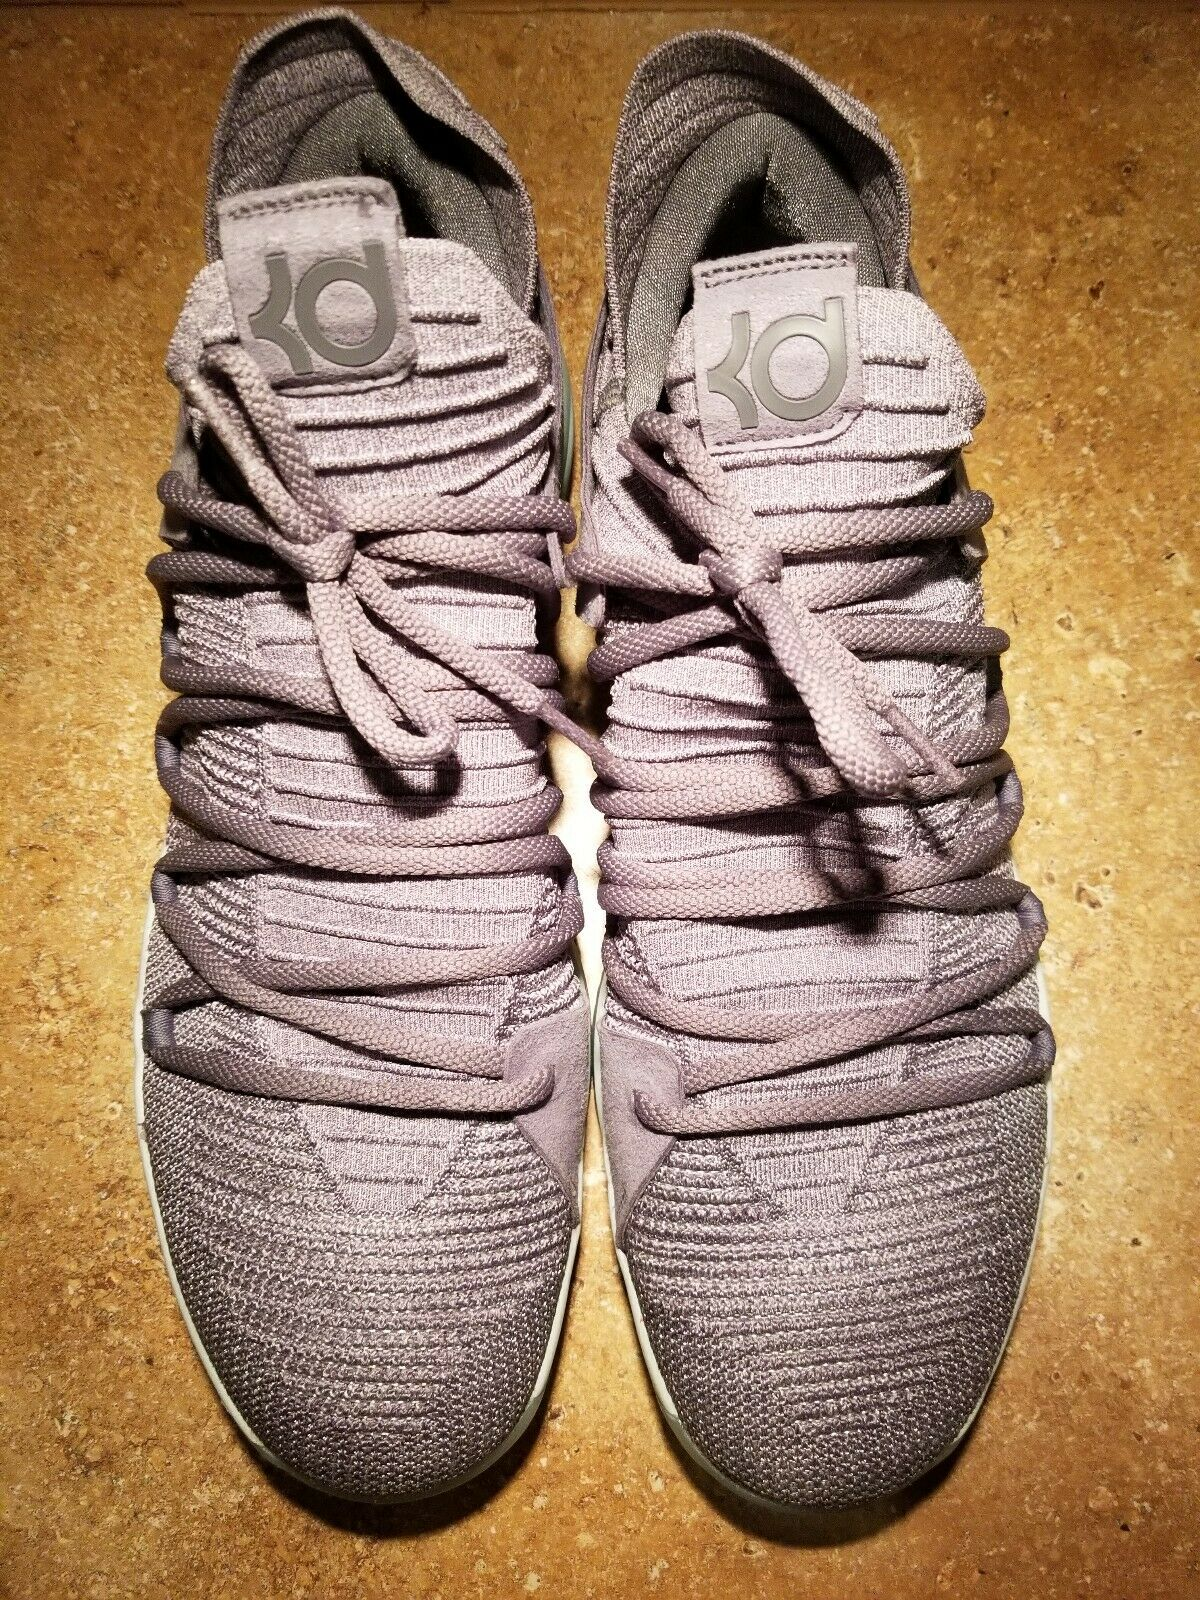 "Nike KD 10 ""Igloo"" Cool GreyIgloo White 897816 002 On Sale"